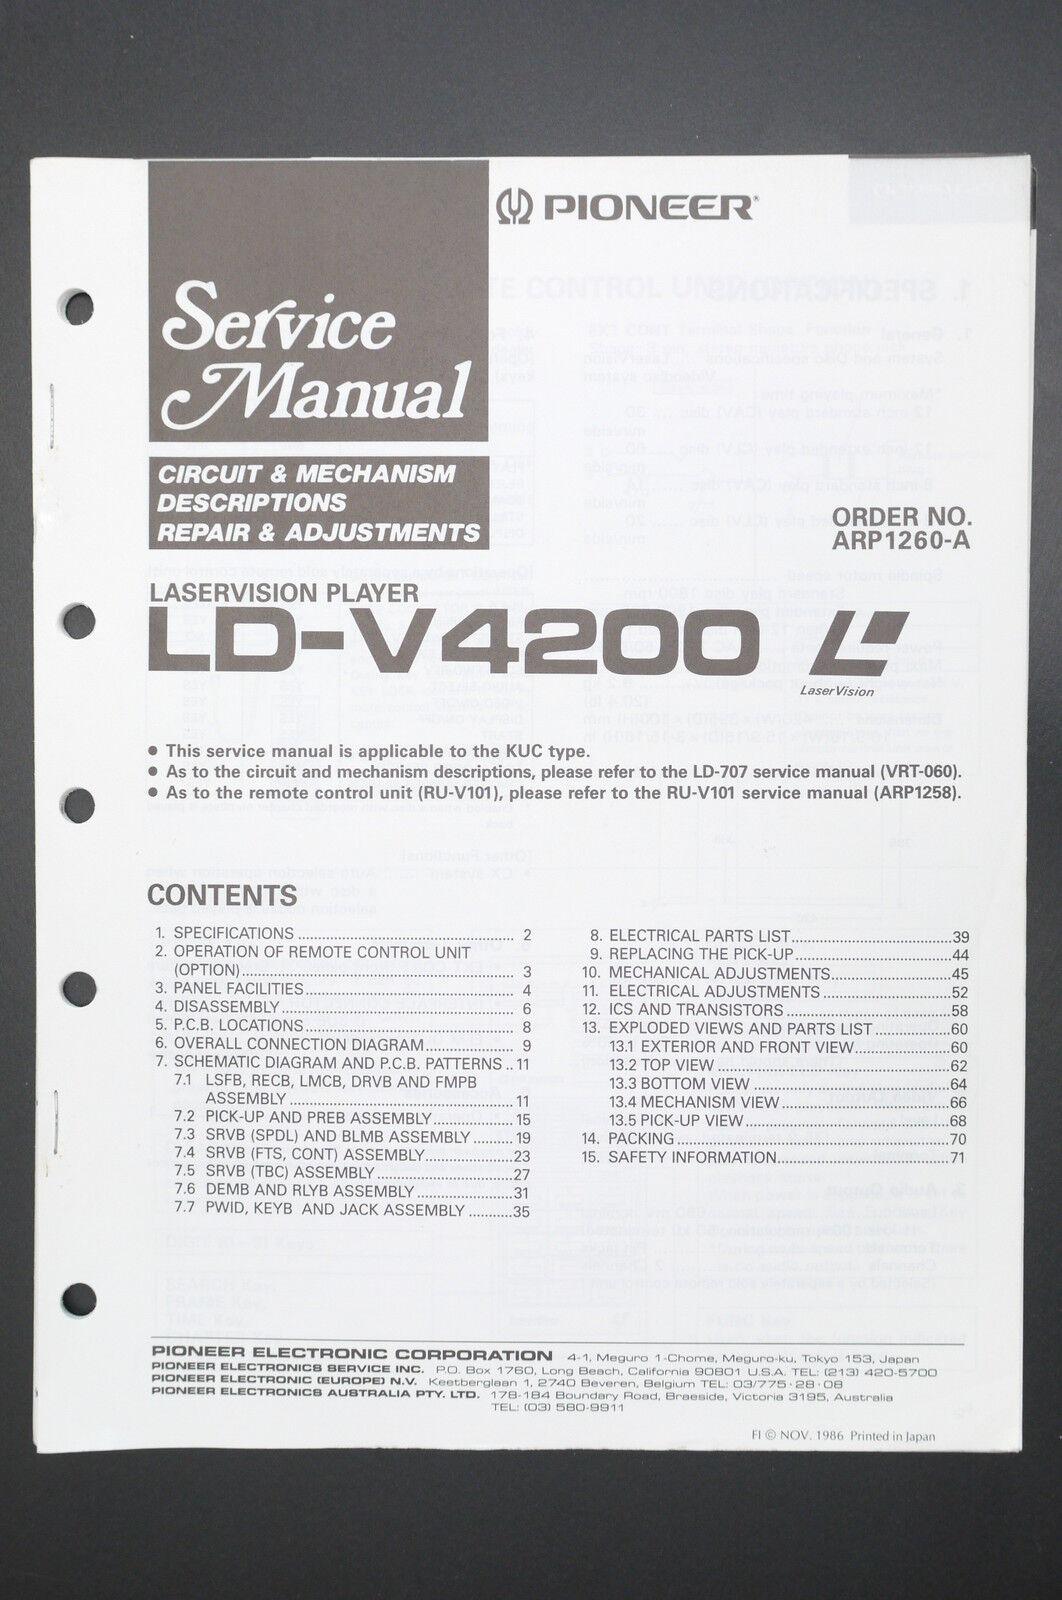 Pioneer Ld V4200 Laser Vision Original Service Manual Guide Wiring Diagram O36